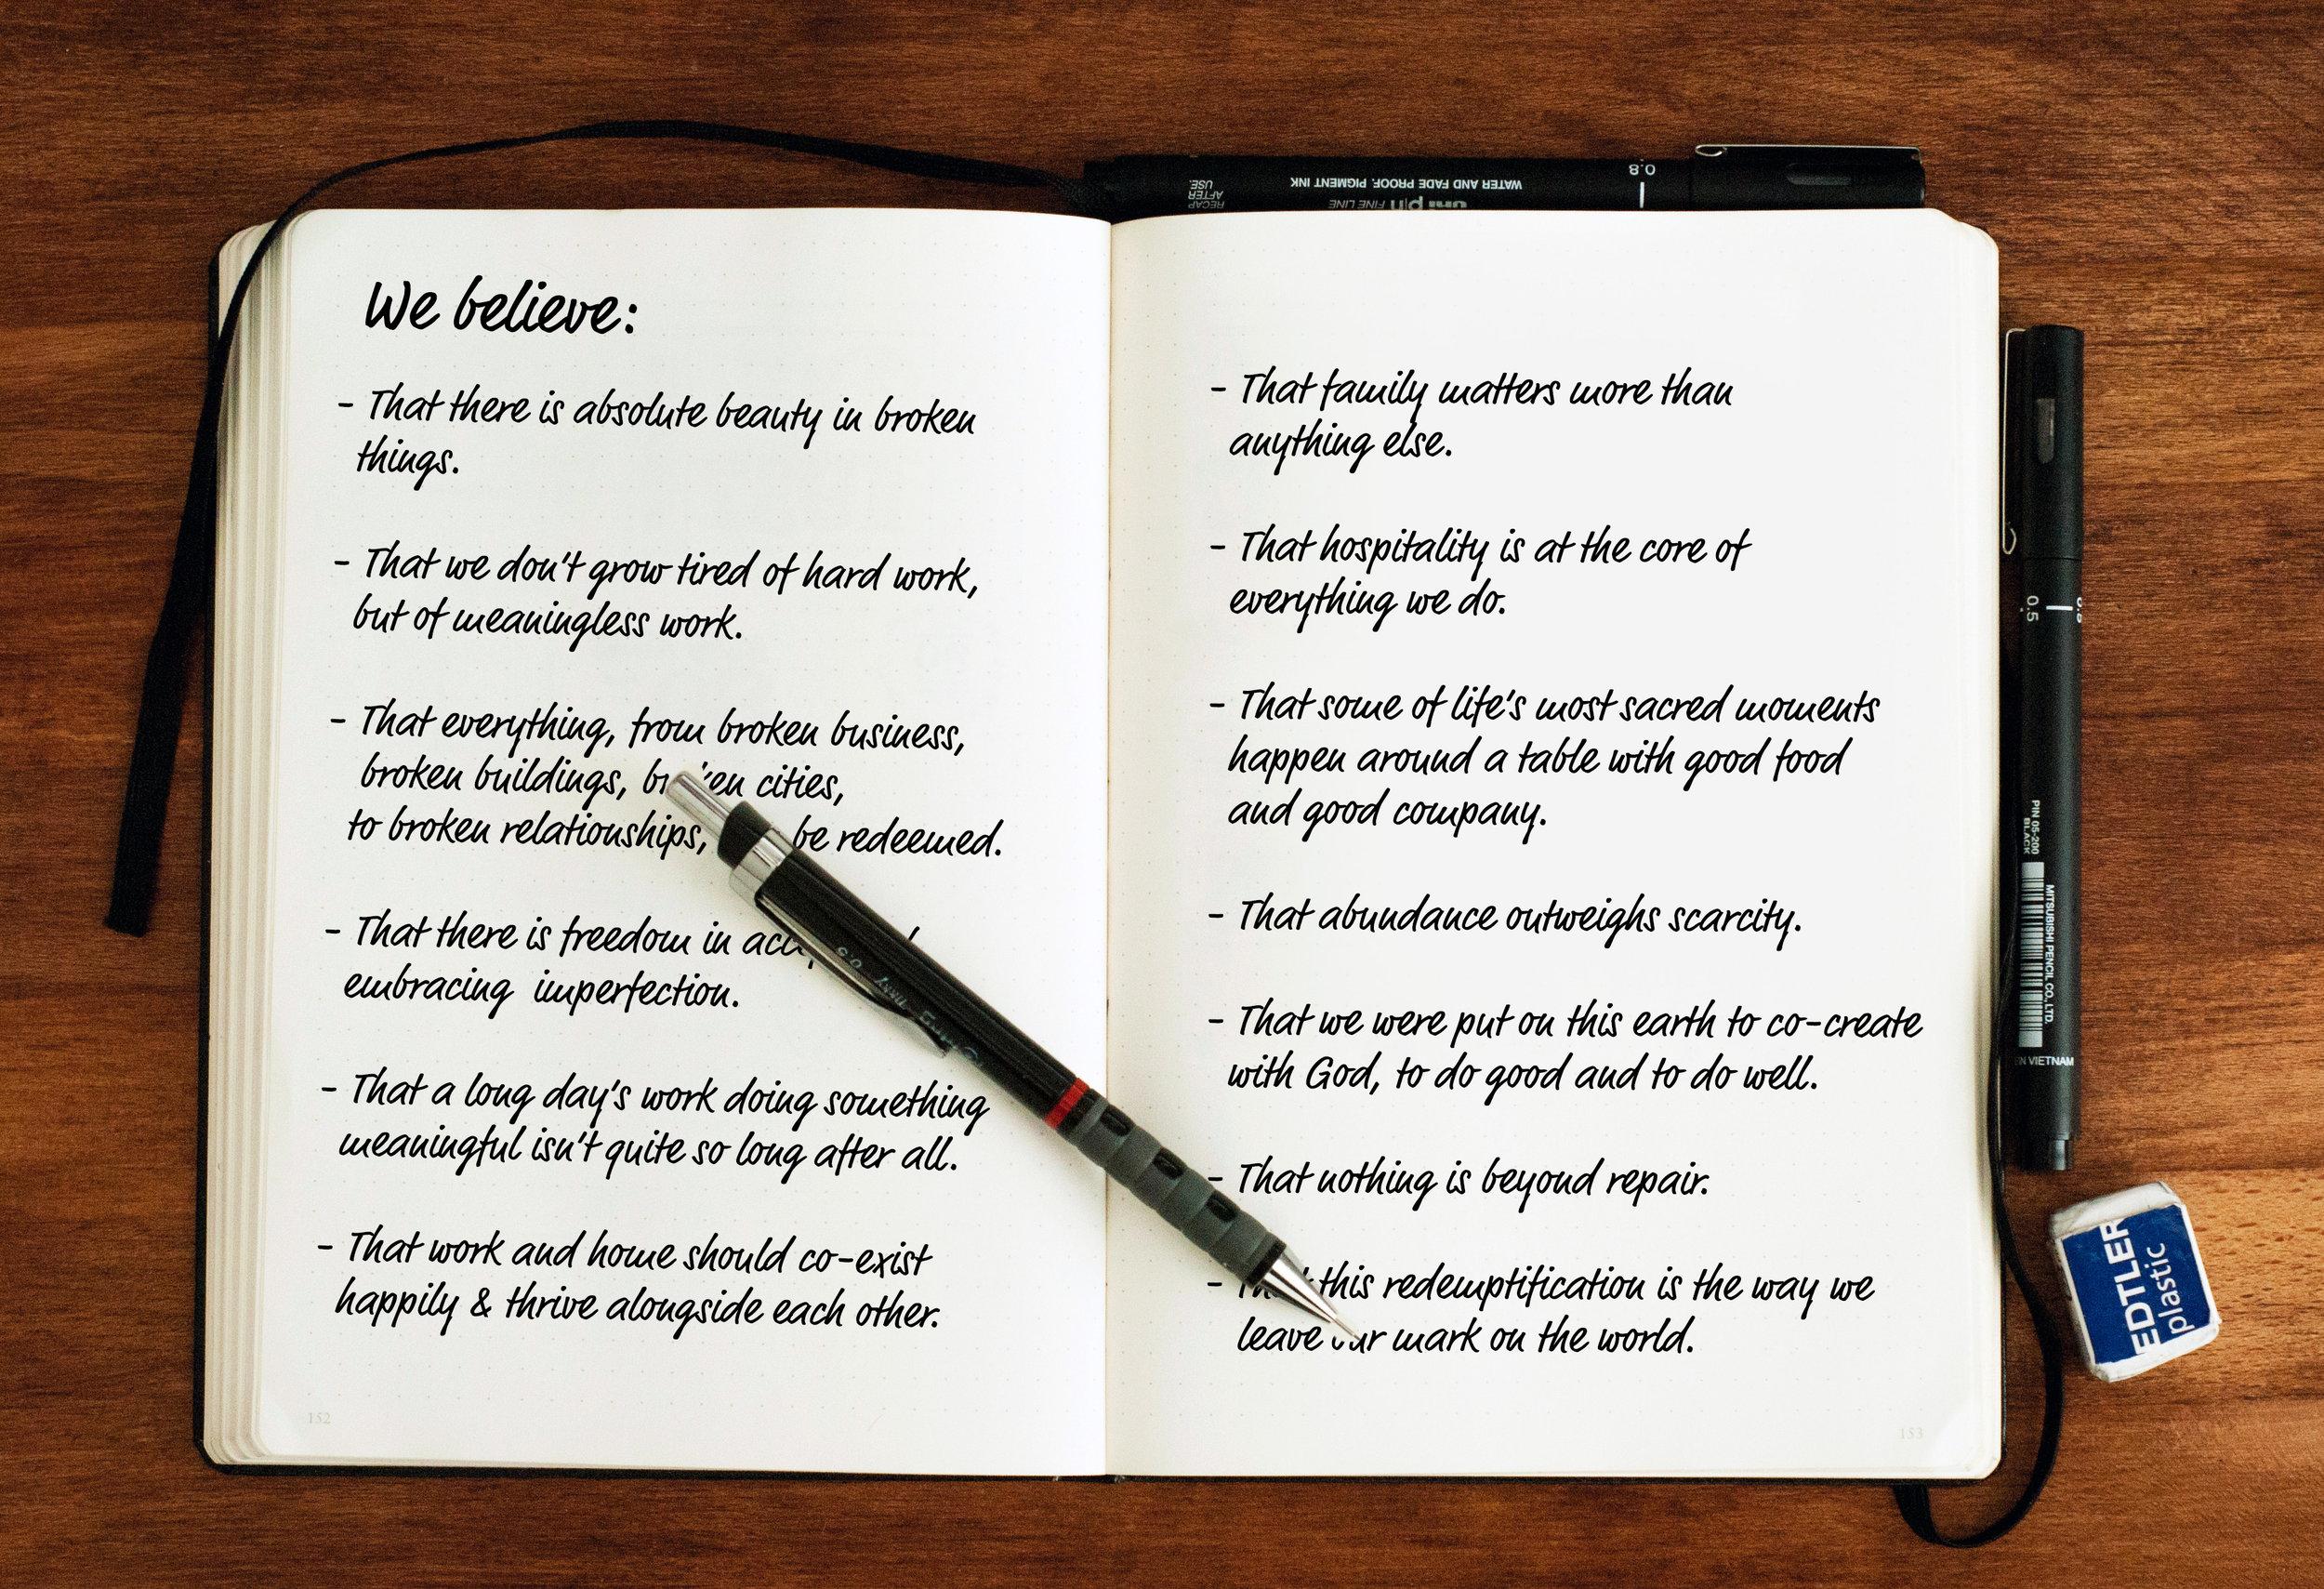 manifesto_notebook image.jpg